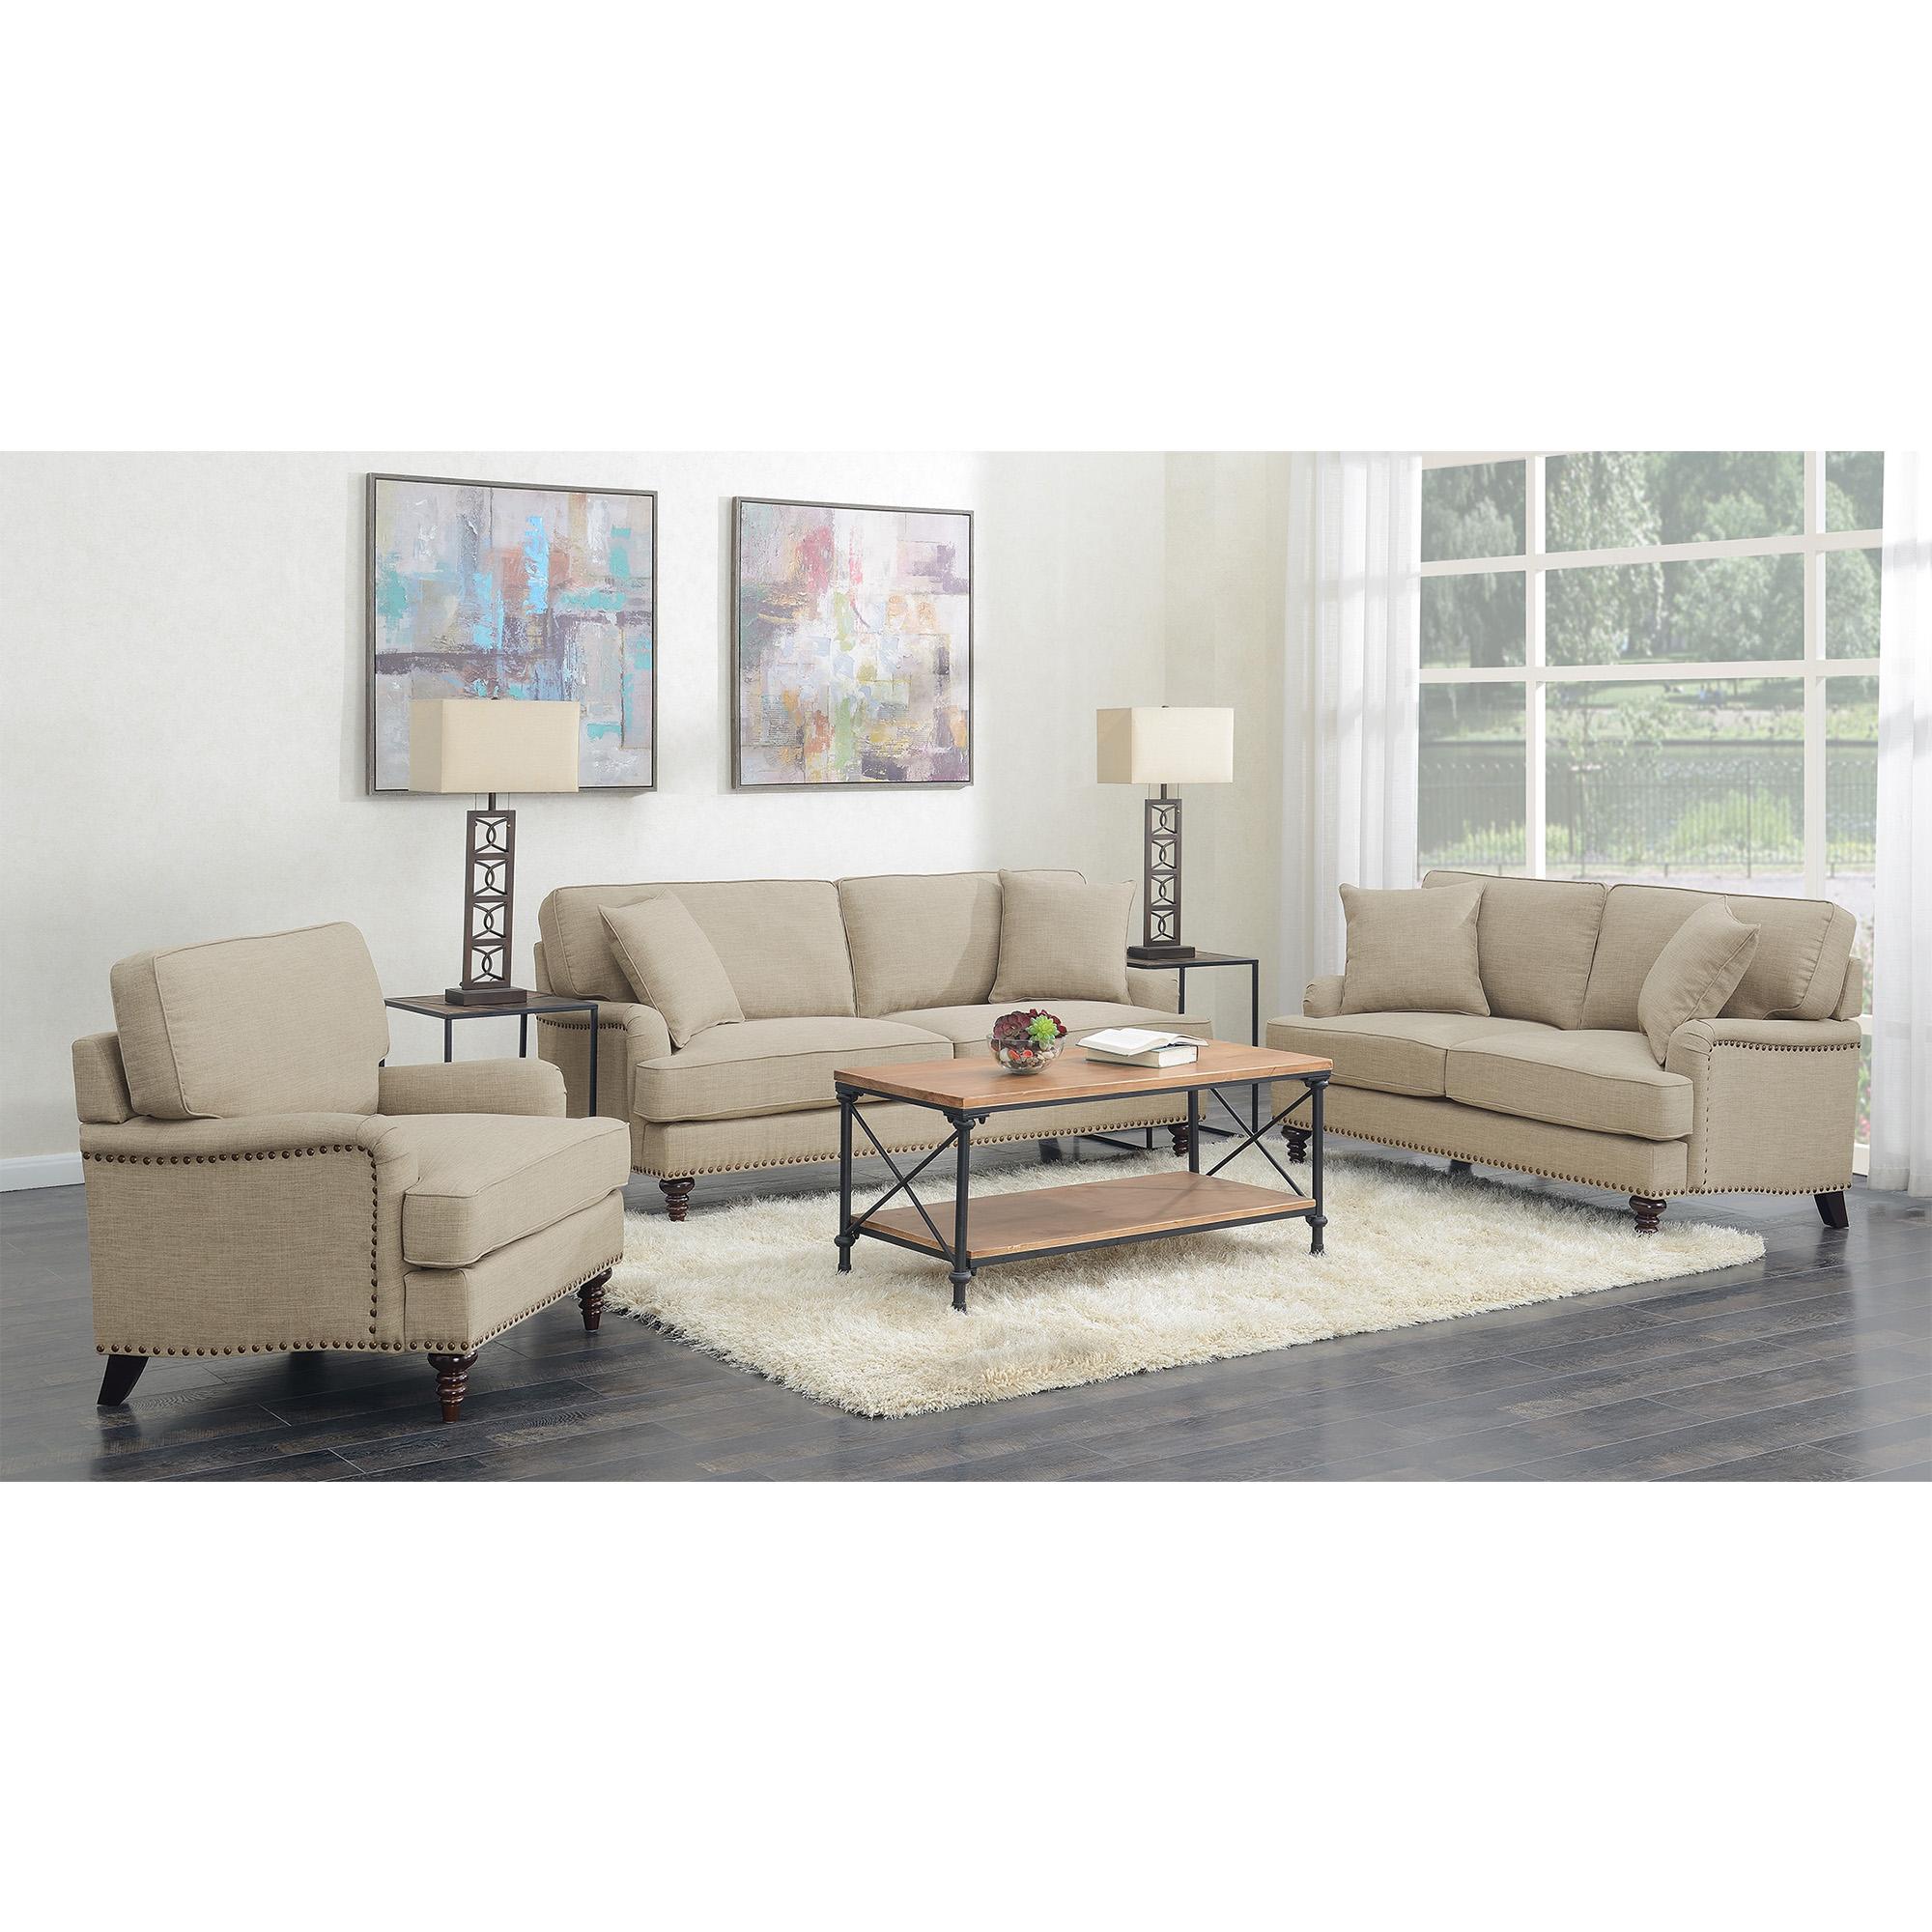 Picket House Living Room Set Sofa Loveseat Chair